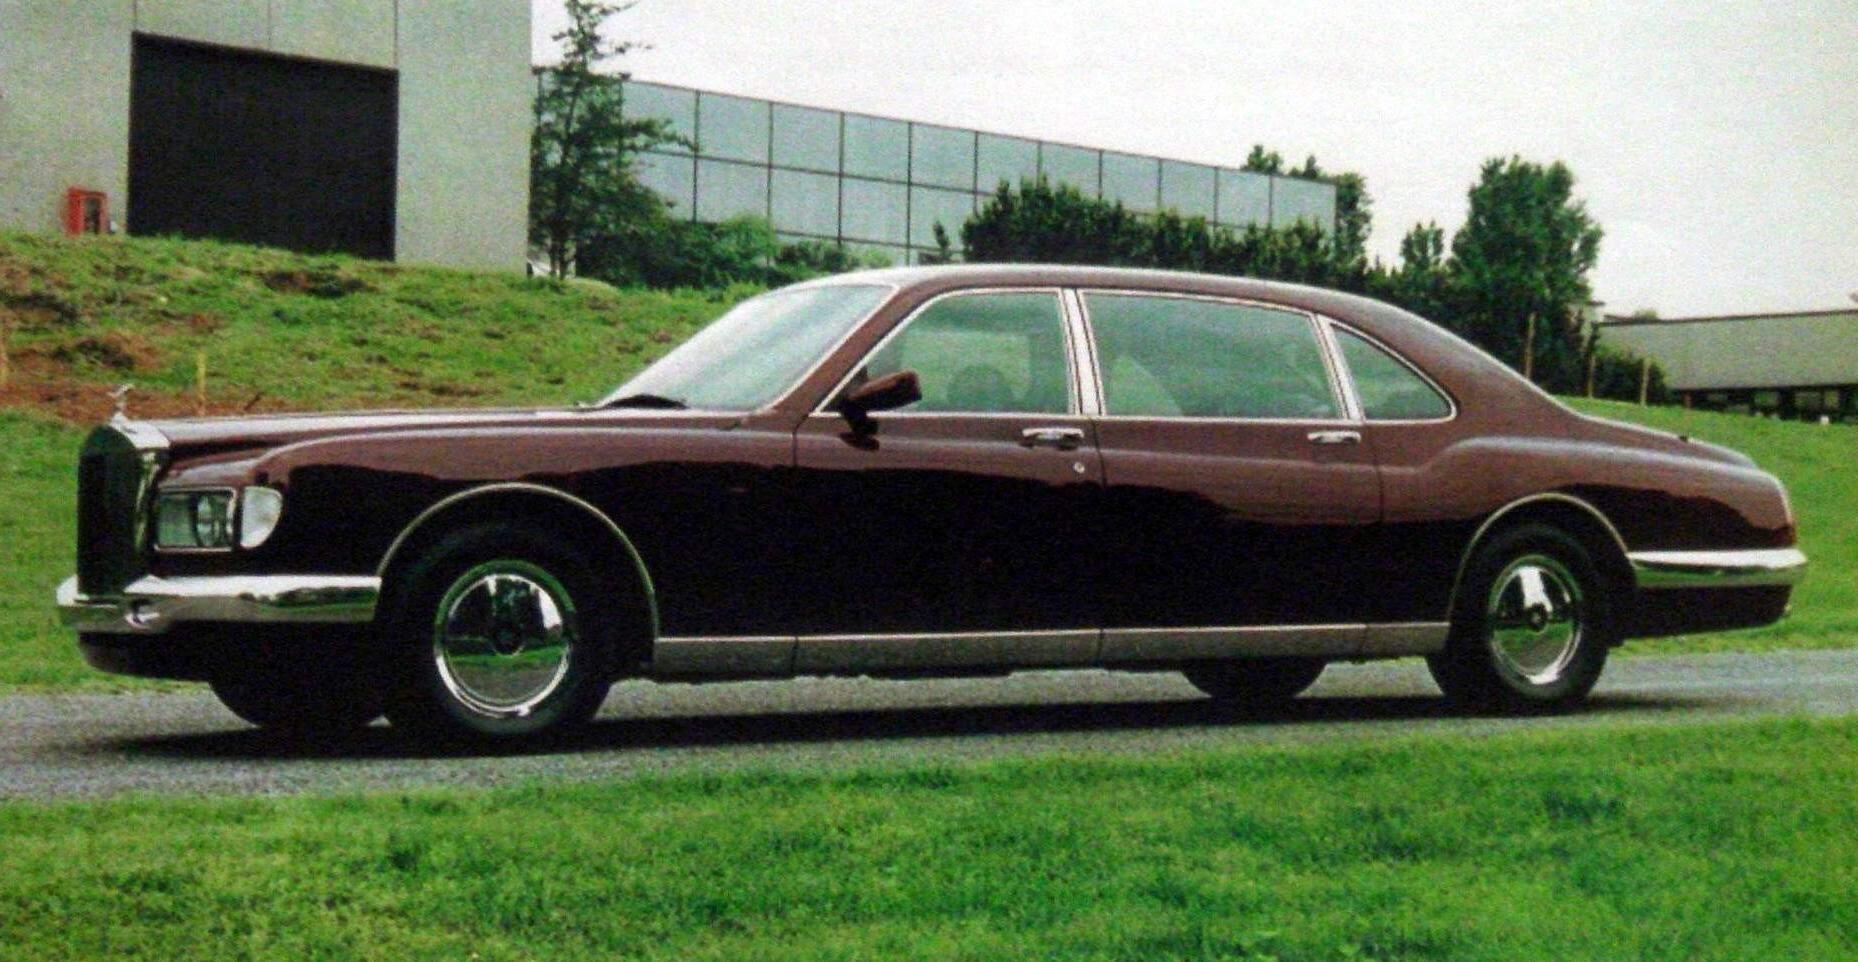 Rolls Royce Phantom Majestic Bertone 1995 World Of Cars